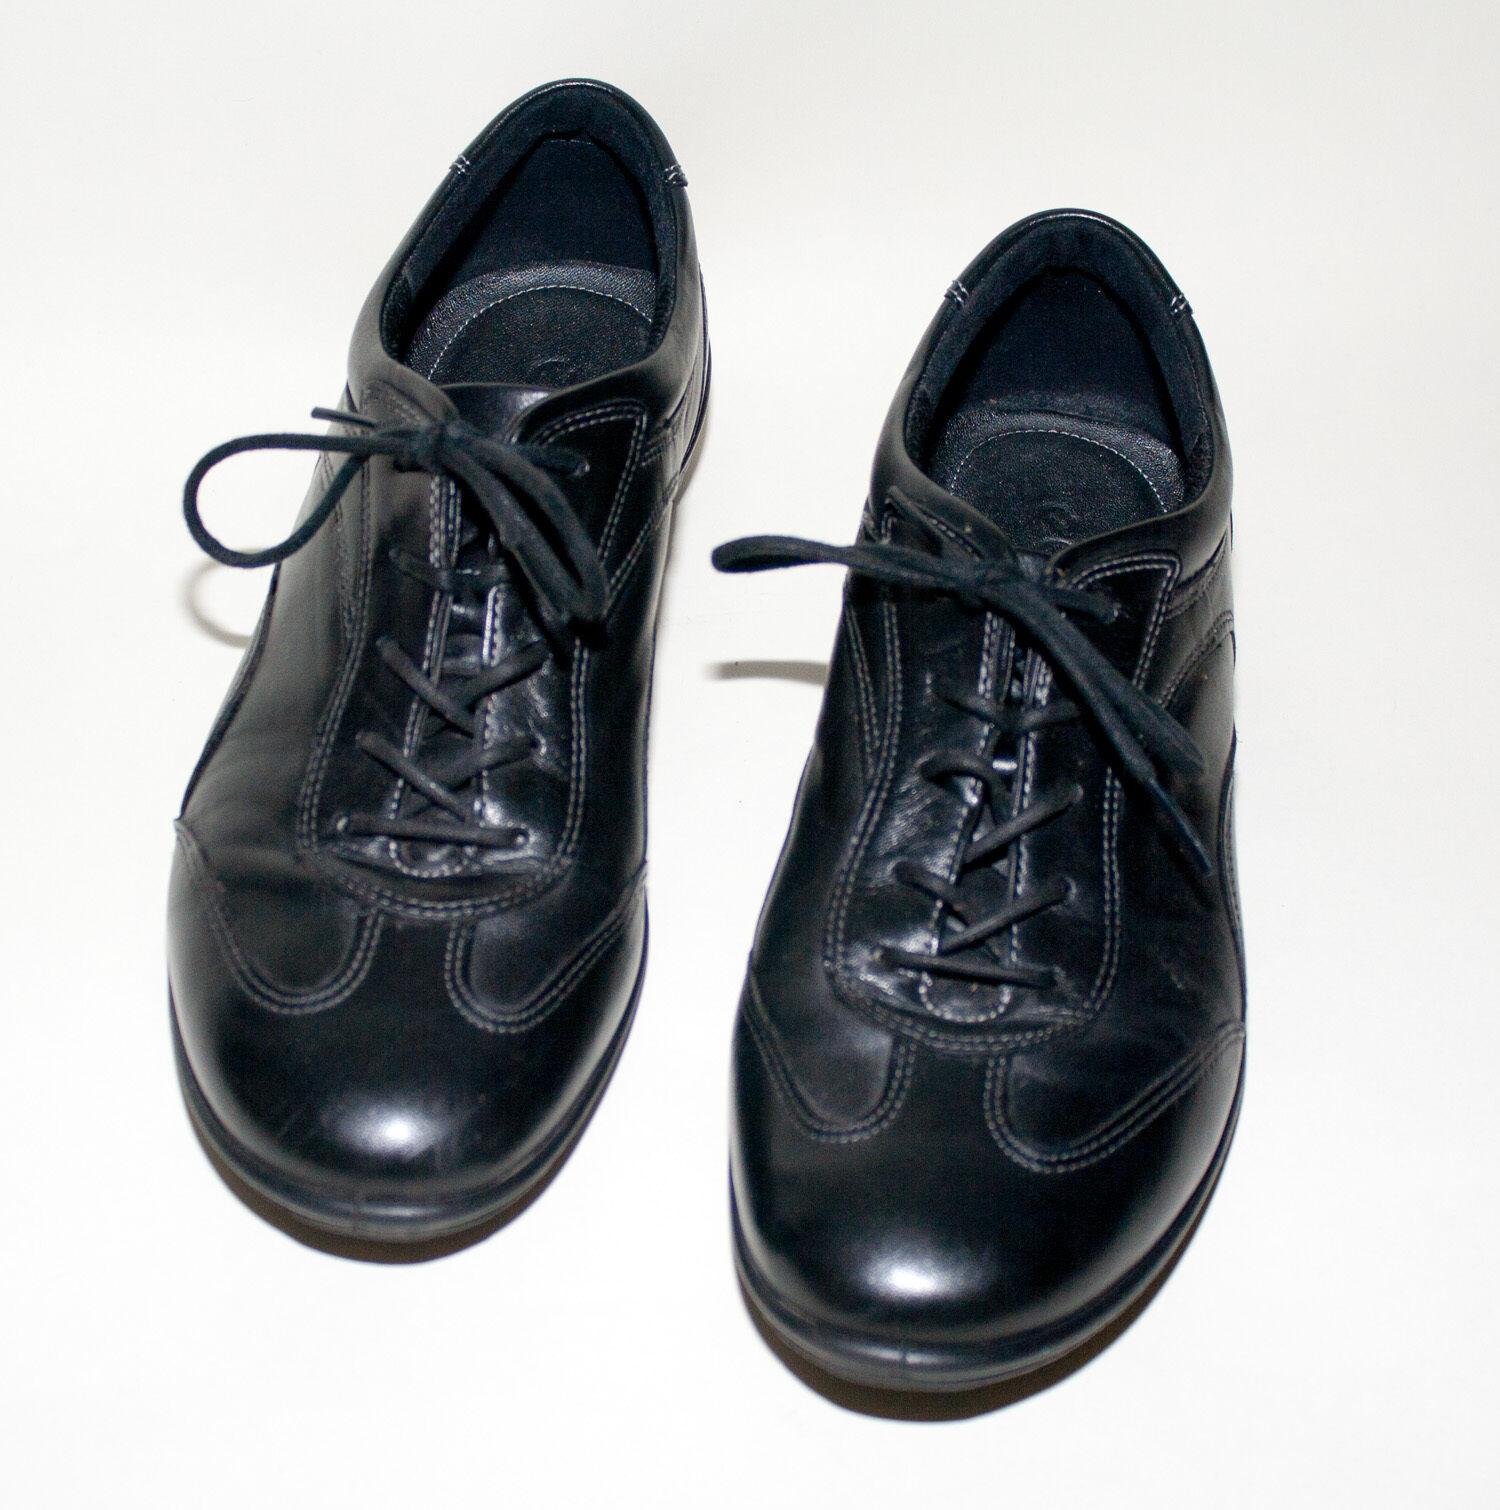 ECCO Schuhe ♥ Loafer ♥ Schnür ♥ Schuhe ECCO ♥ Gr. 39  ♥ NEUw  ♥ Leder ♥ herusnehmbar Sohle b34546